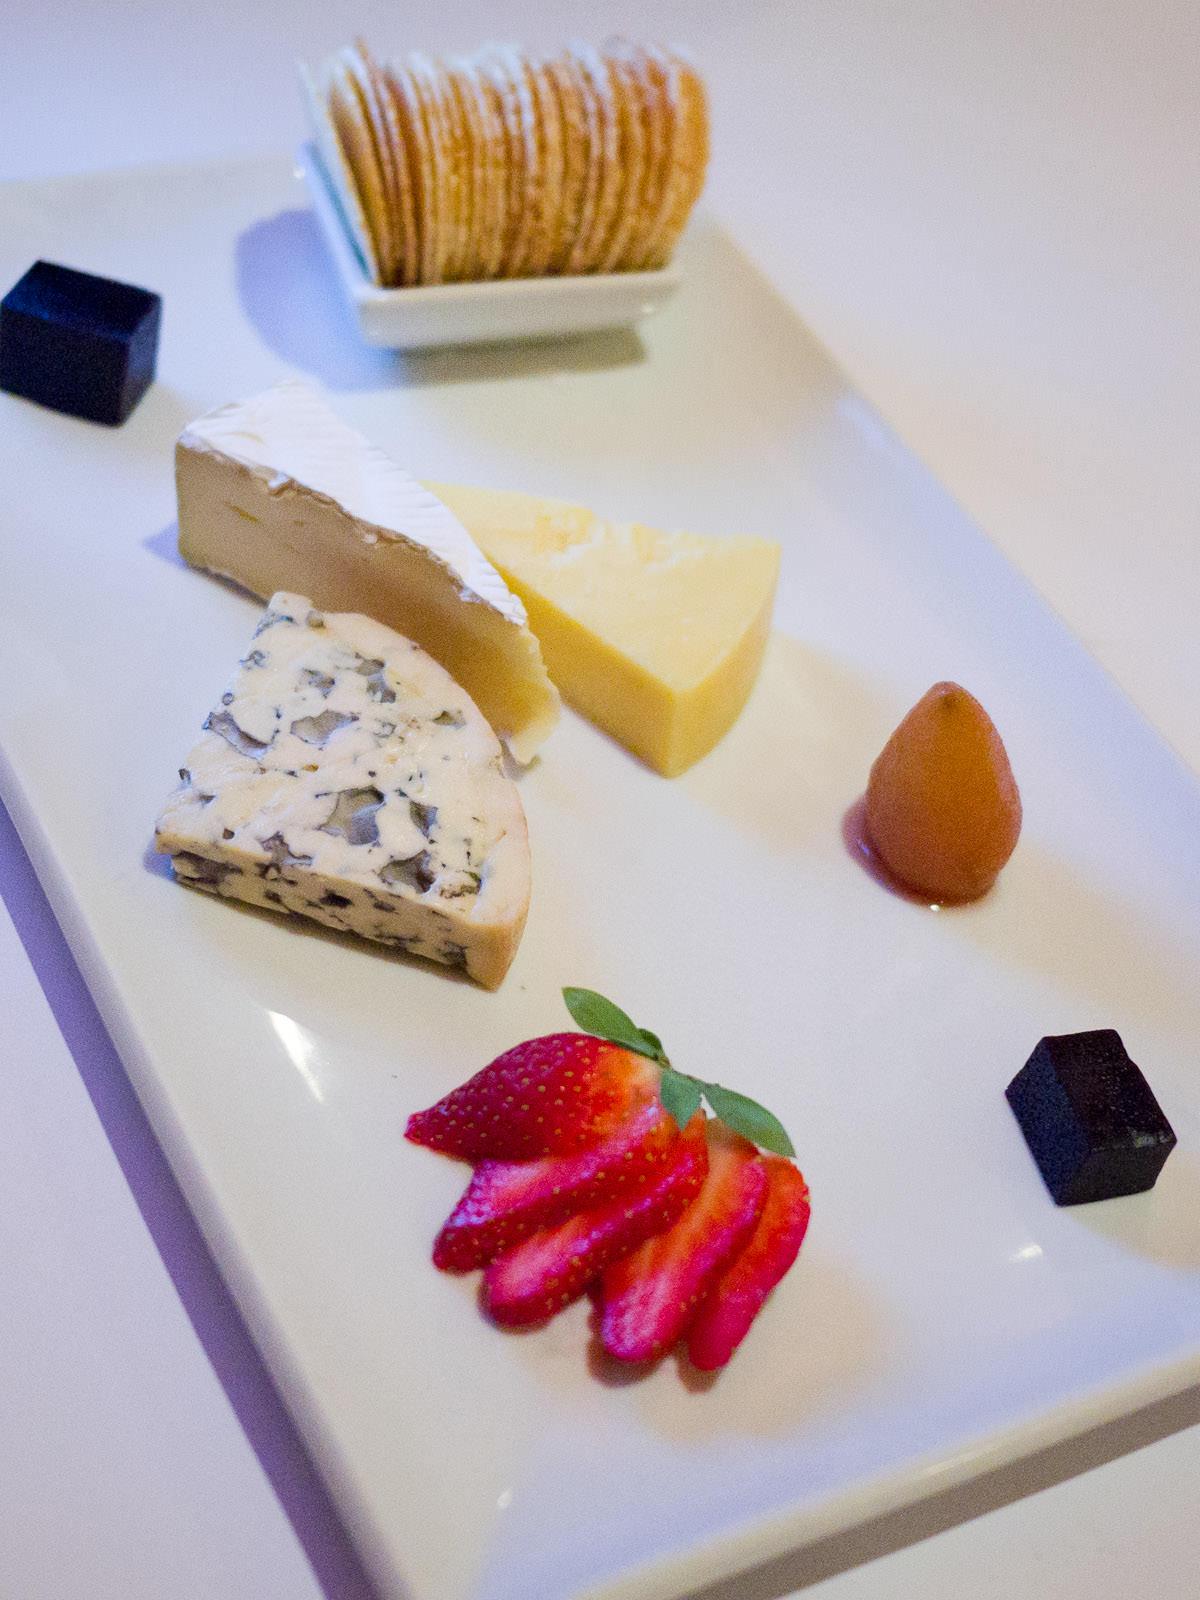 Cheeseboard - Roitelet Brie (France), Fourme d'Ambert Blue (France), Maffra clothbound cheddar (Victoria)